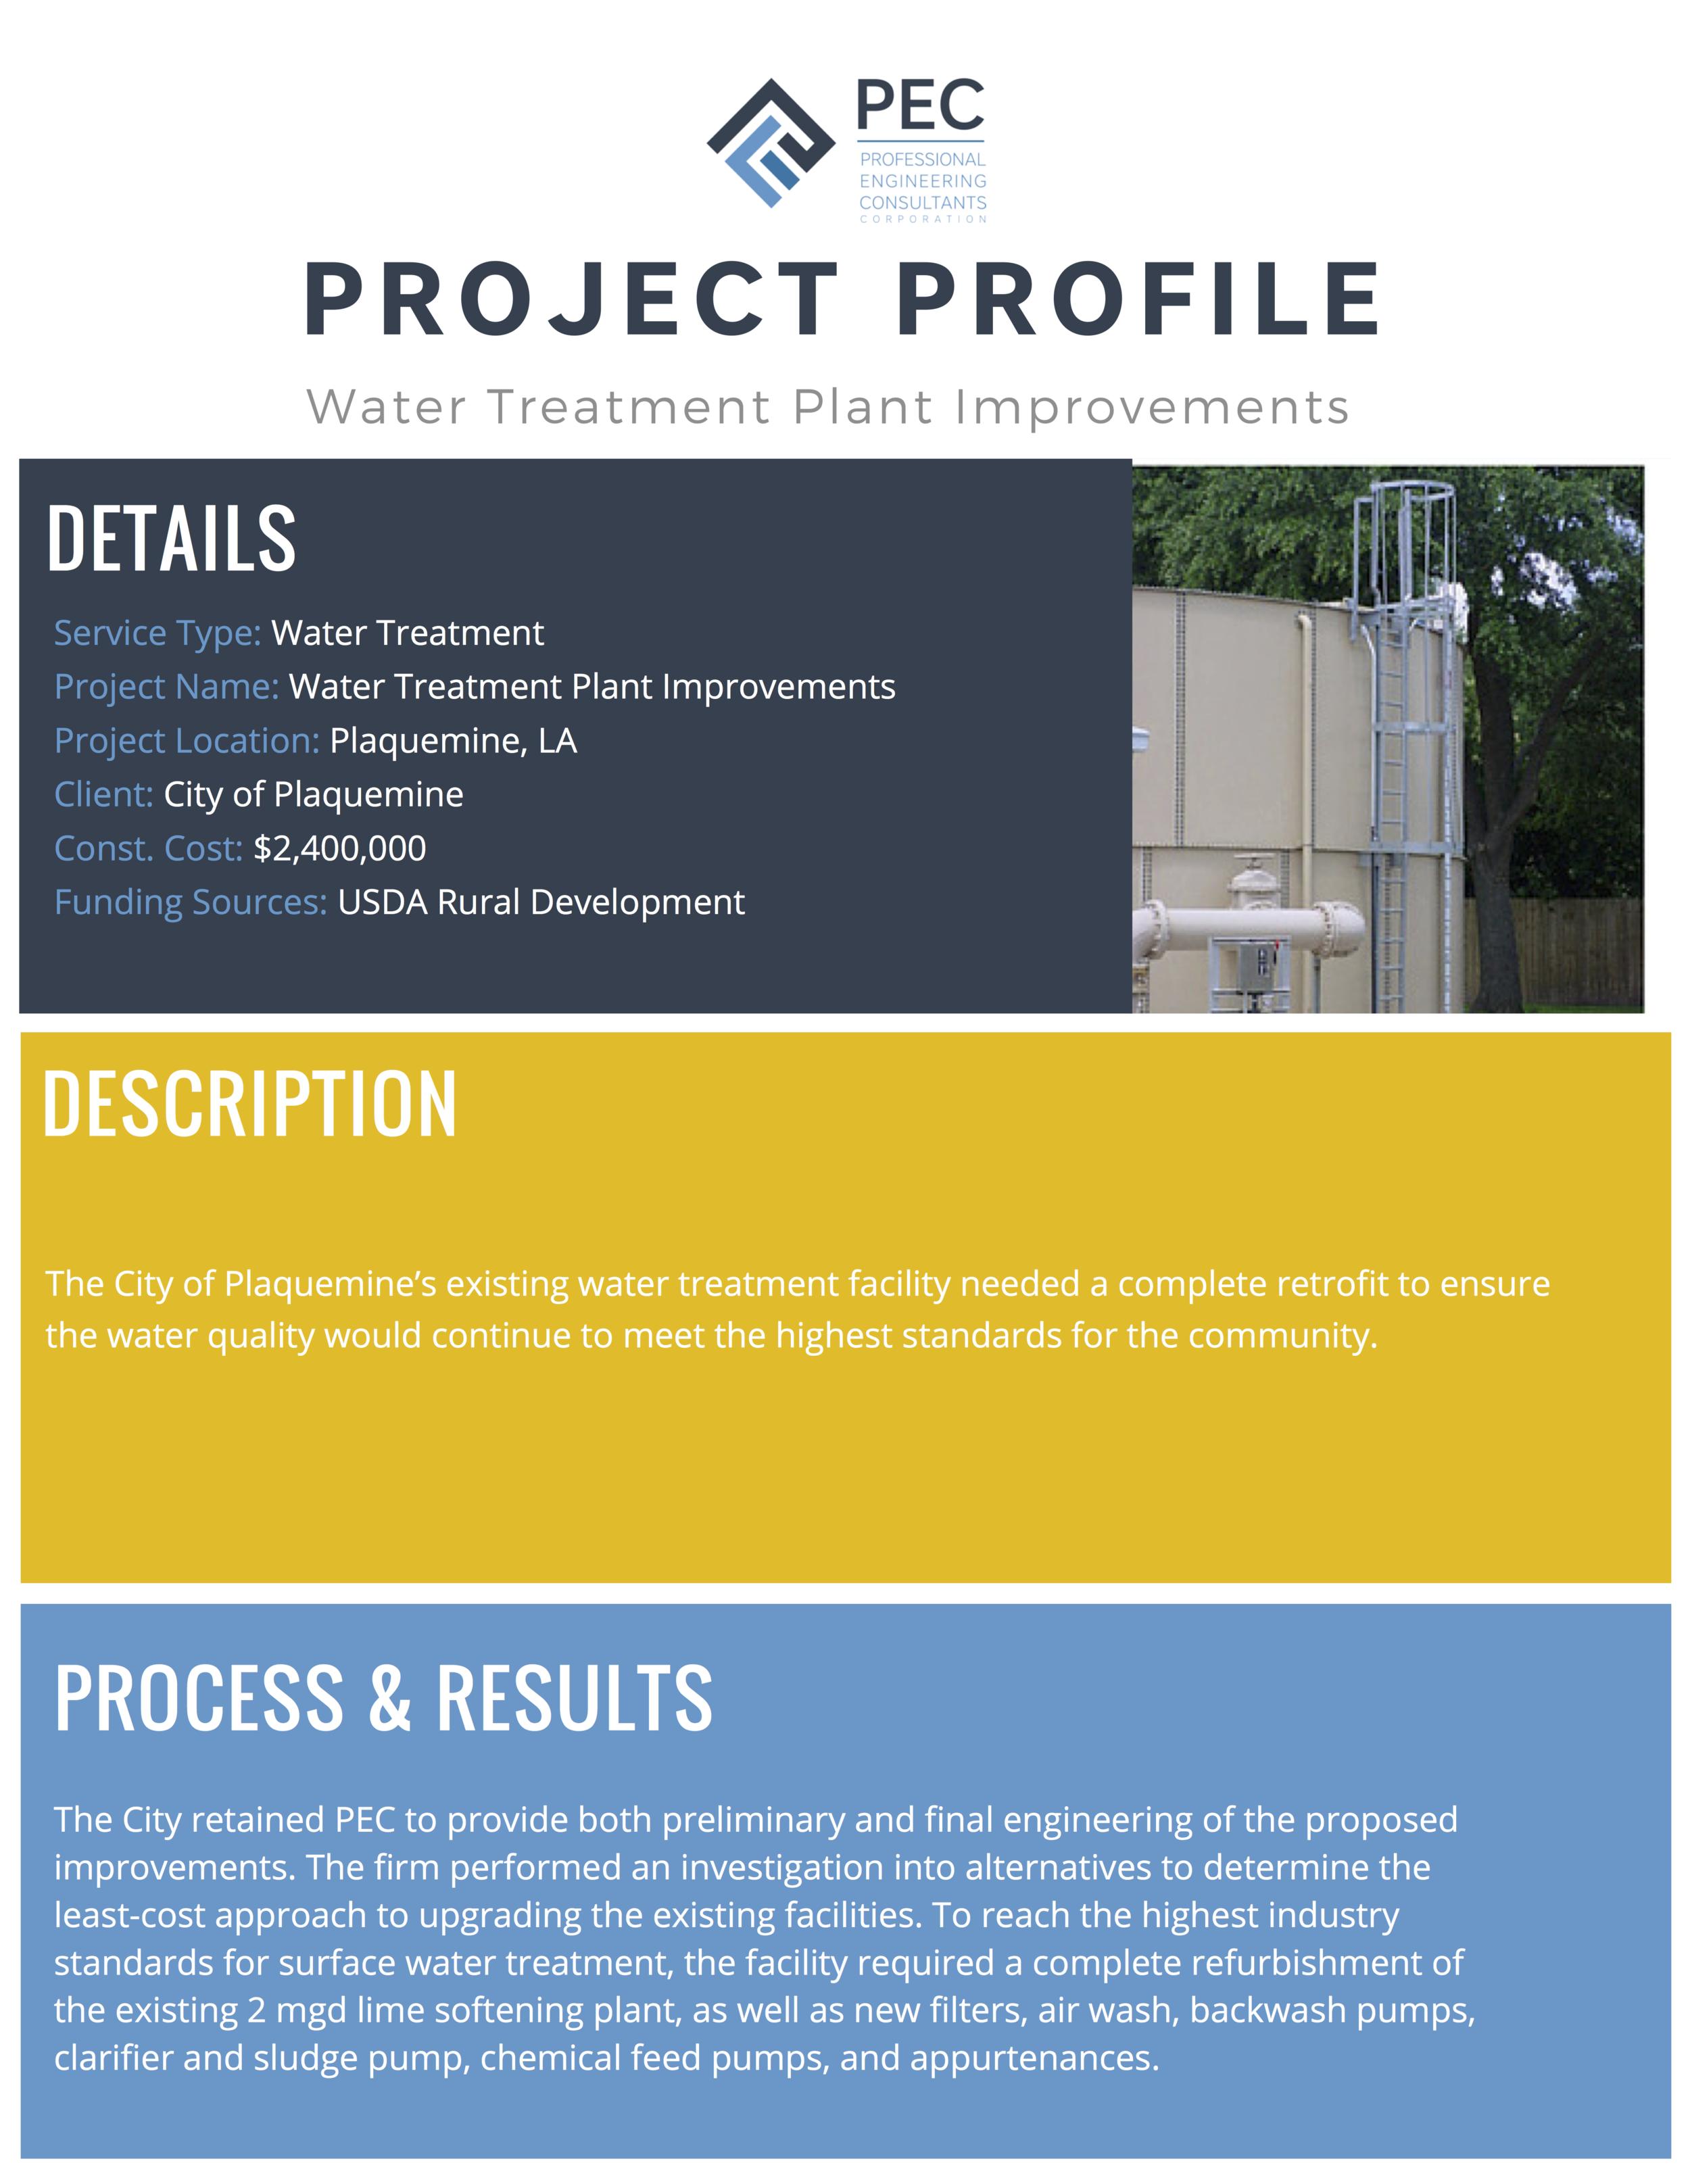 Project Profile_Water Treatment Plant Improvements (1).jpg